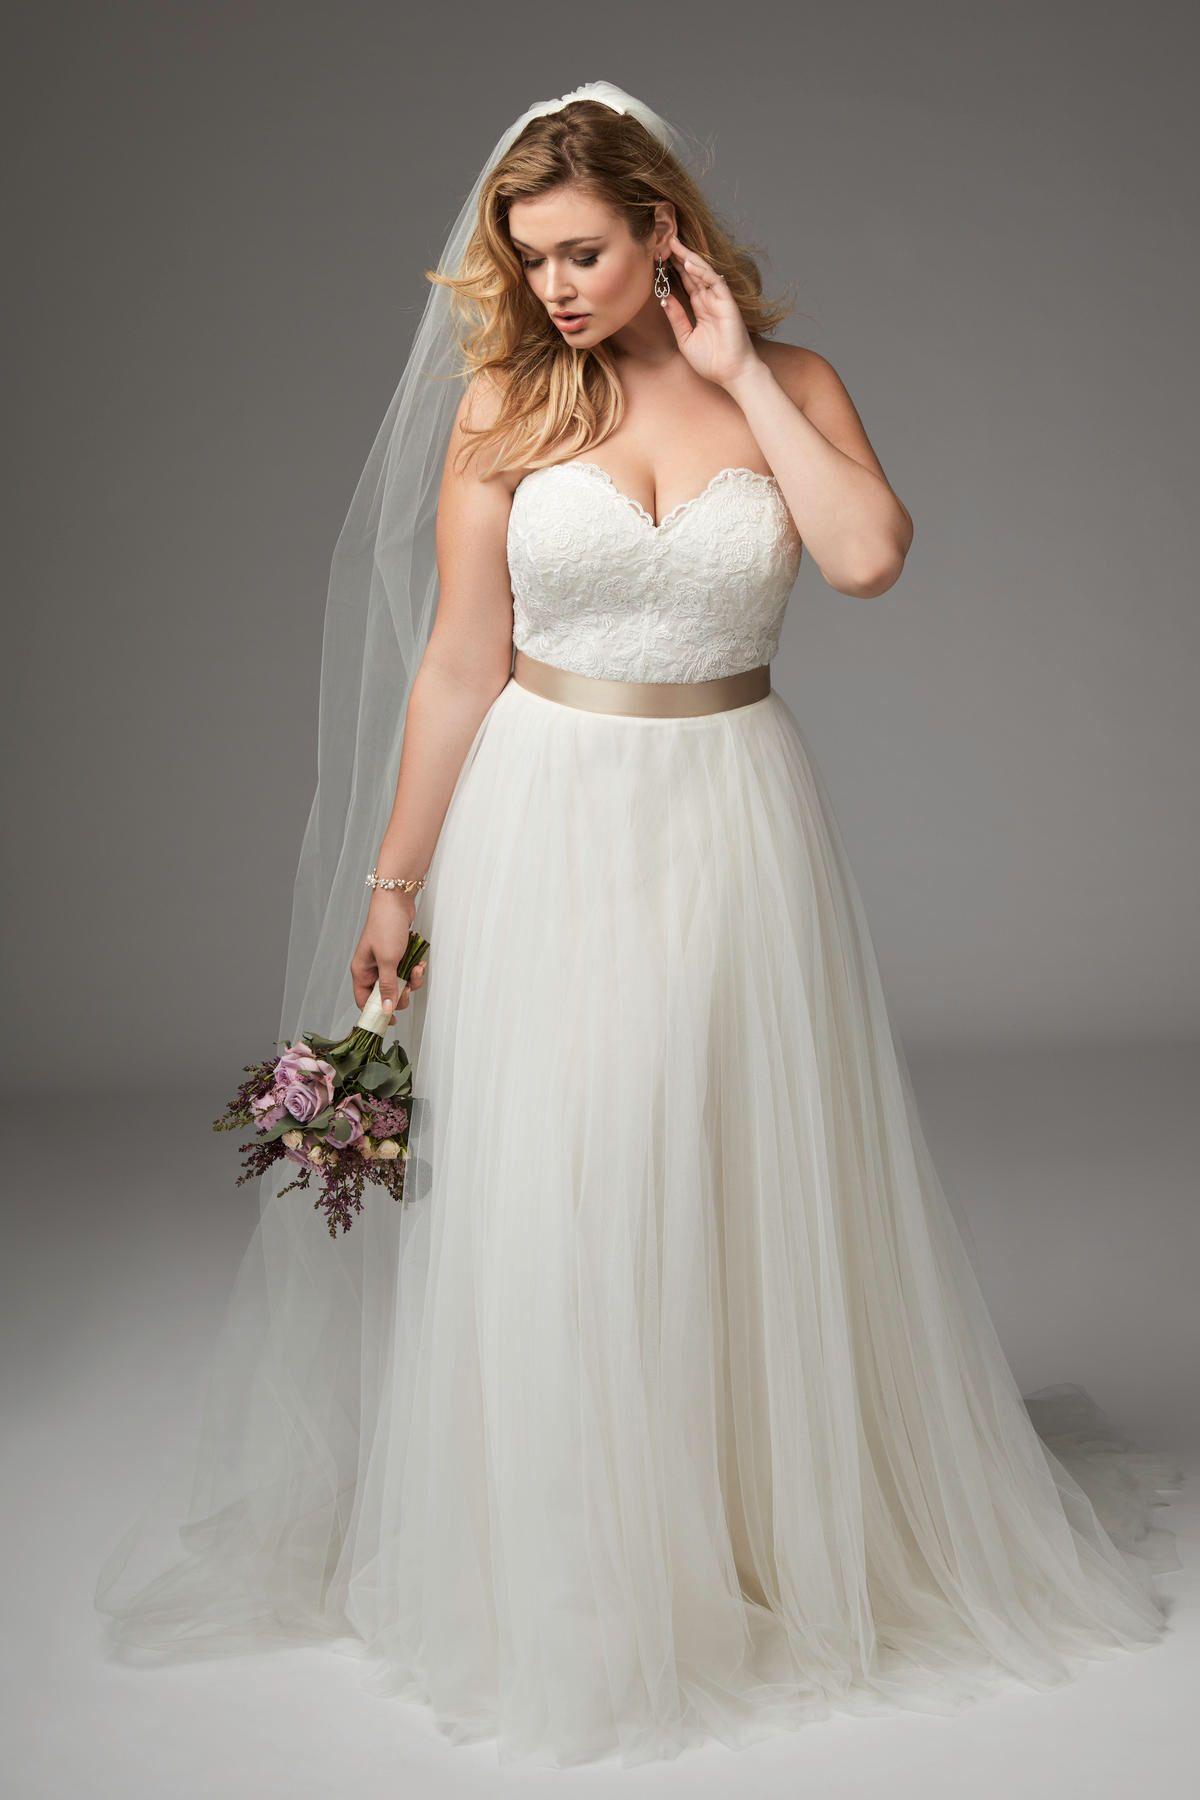 Blue plus size wedding dresses  Pin by Sierra Nicole on Dream Wedding uc in   Pinterest